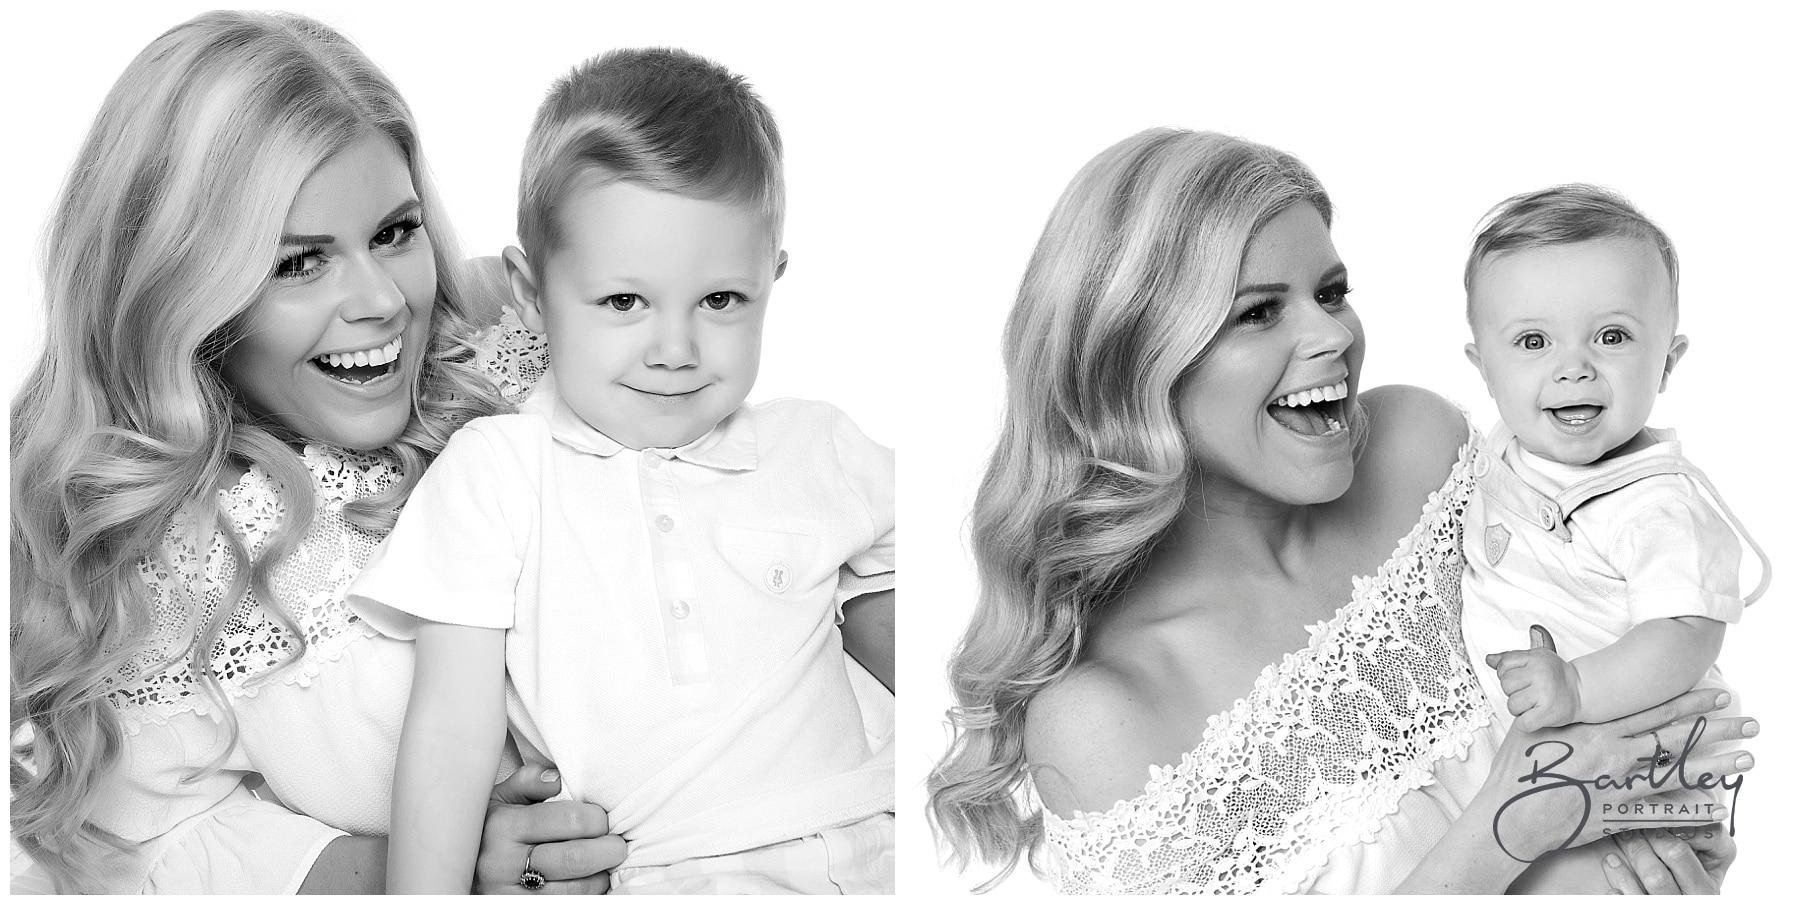 white tops family photograph takin in studio